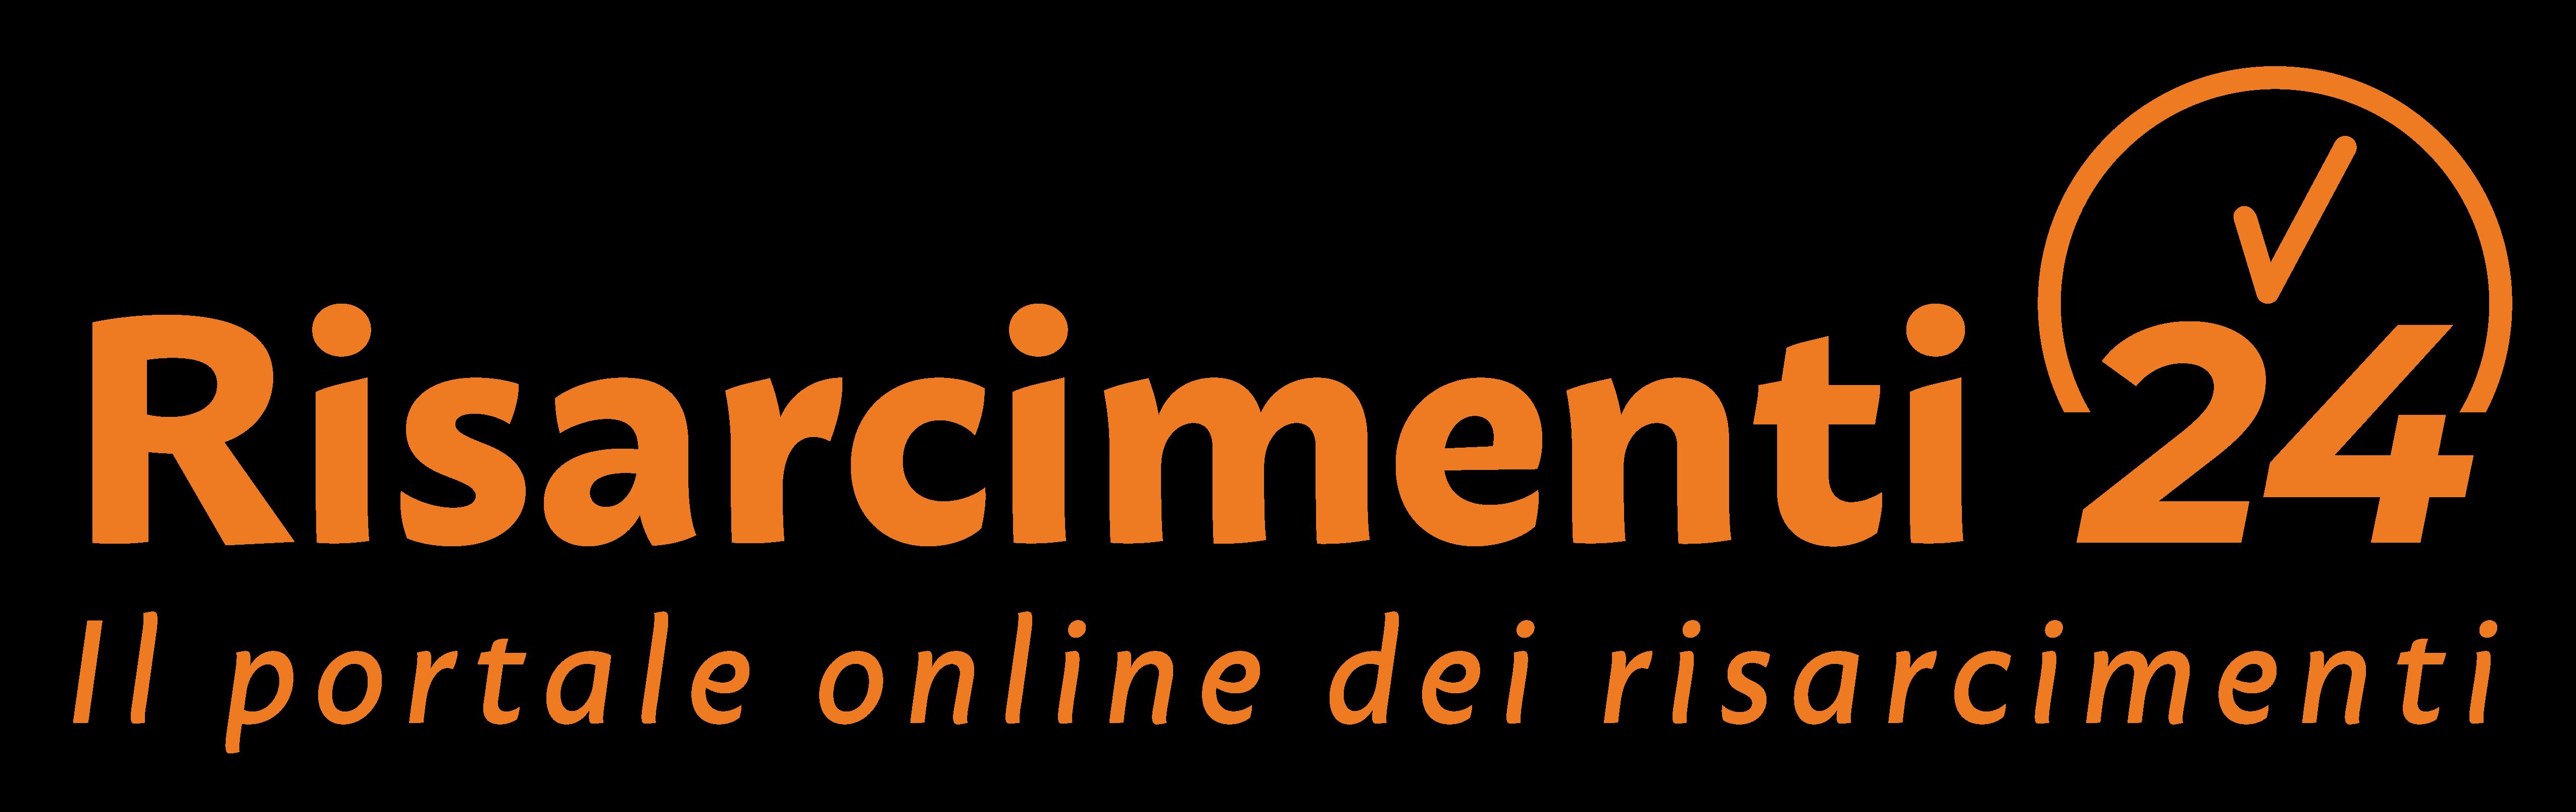 Risarcimenti24